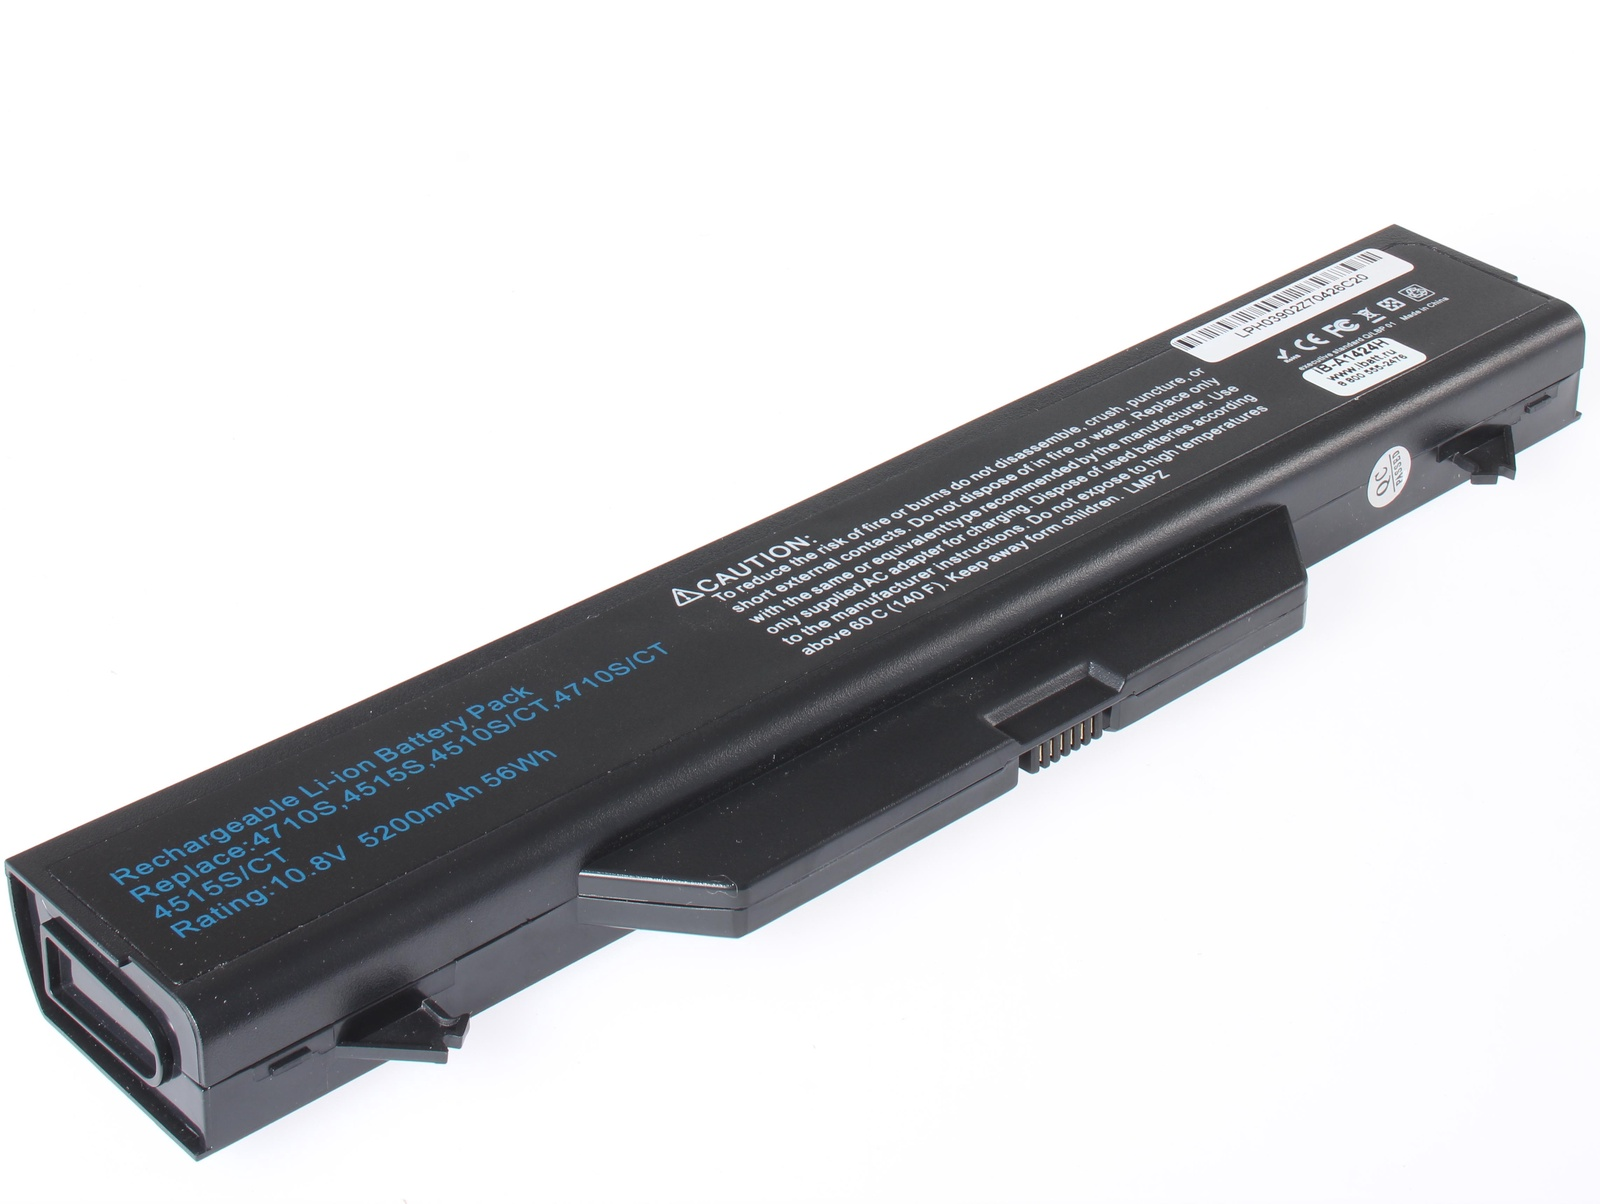 Аккумуляторная батарея iBatt iB-A1-A1424H 5200mAh для ноутбуков HP-Compaq HSTNN-LB88, HSTNN-iB89, HSTNN-iB88, HSTNN-OB89, NZ375AA, HSTNN-I61C, HSTNN-I60C, 593576-001, HSTNN-I61C-5, HSTNN-OB88, 572032-001, 535753-001, HSTNN-W79C-7, windows 7 для ноутбуков hp